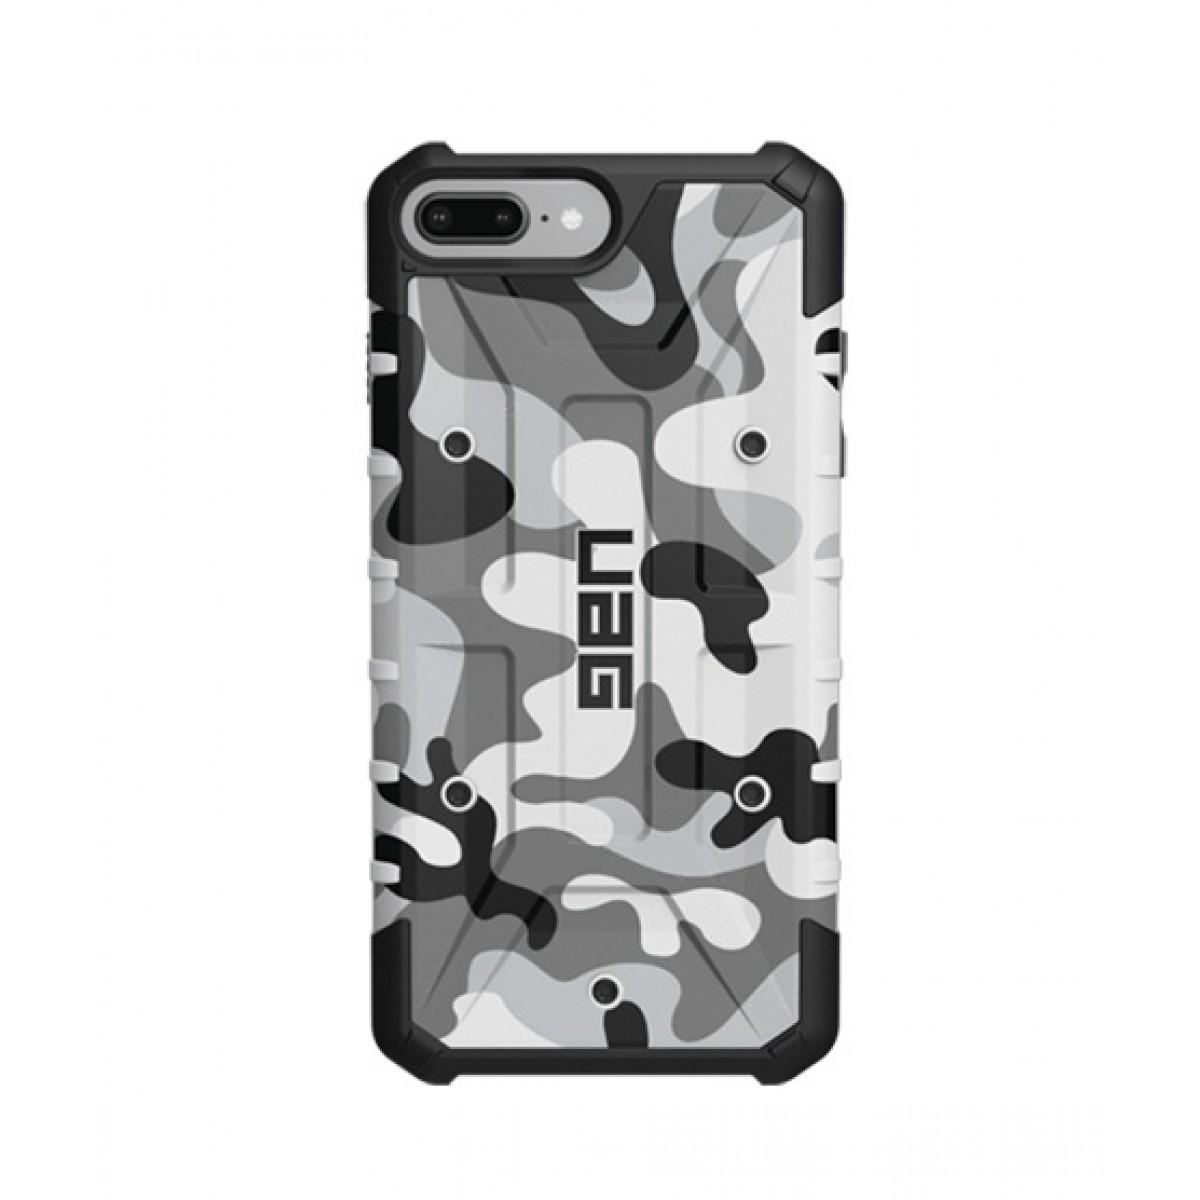 brand new 2f622 9cf60 UAG Pathfinder Se Camo Series Arctic Case For iPhone 8 Plus